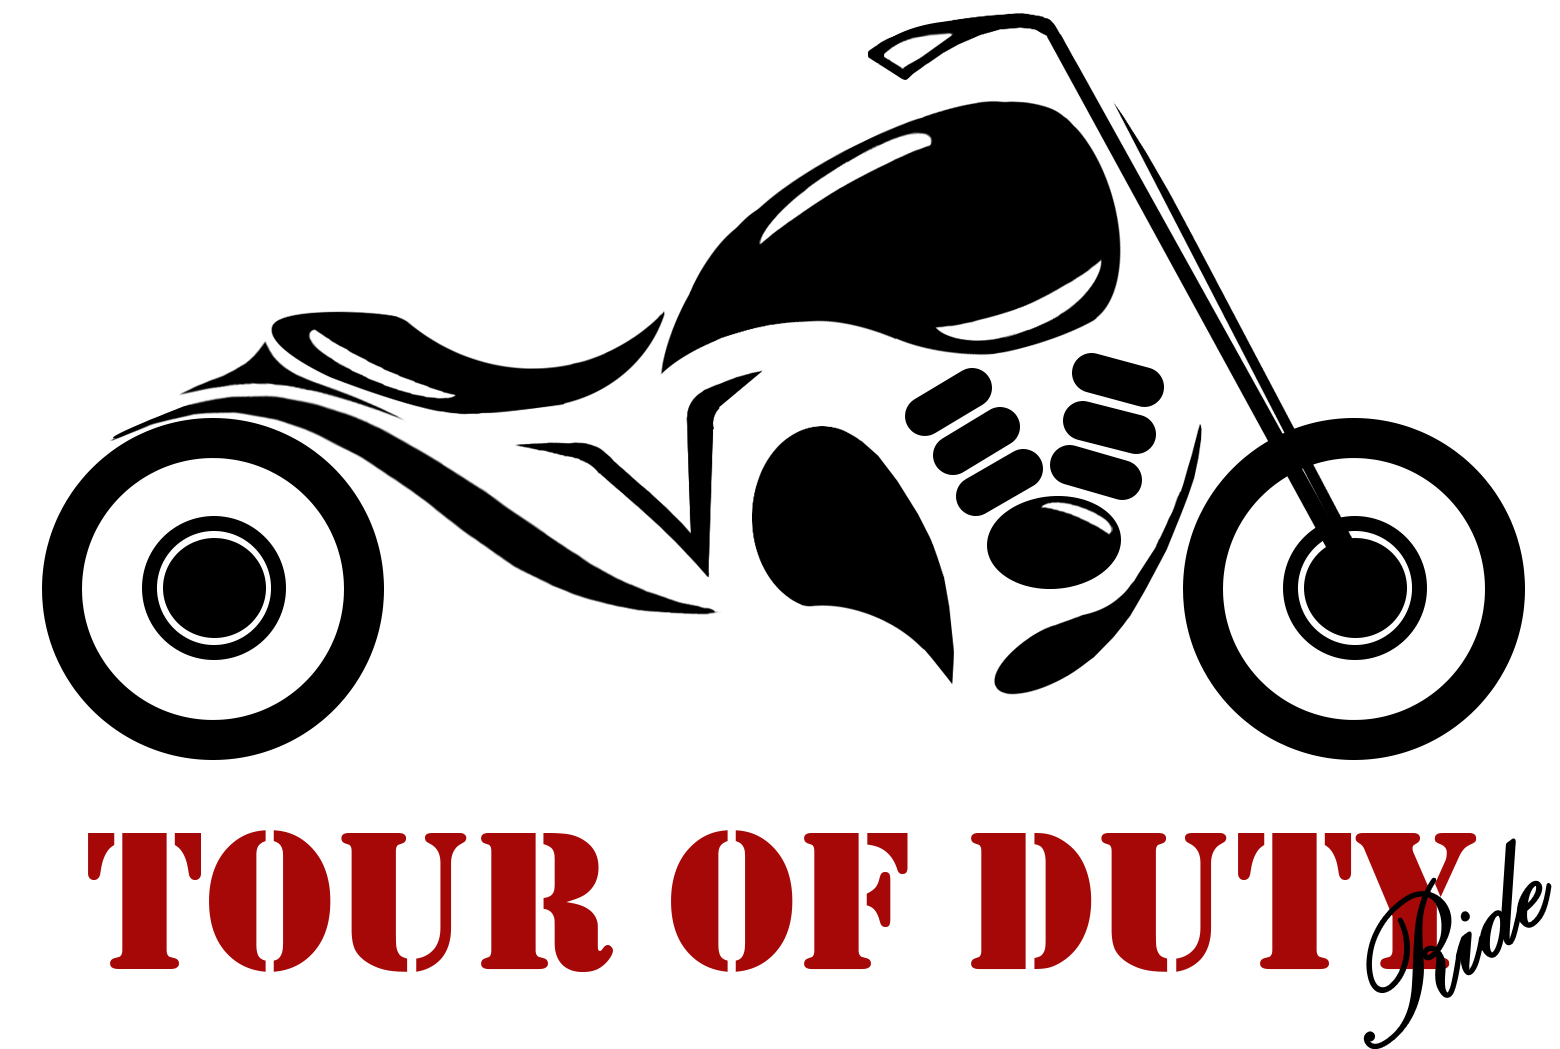 tour-of-duty-ride-logo